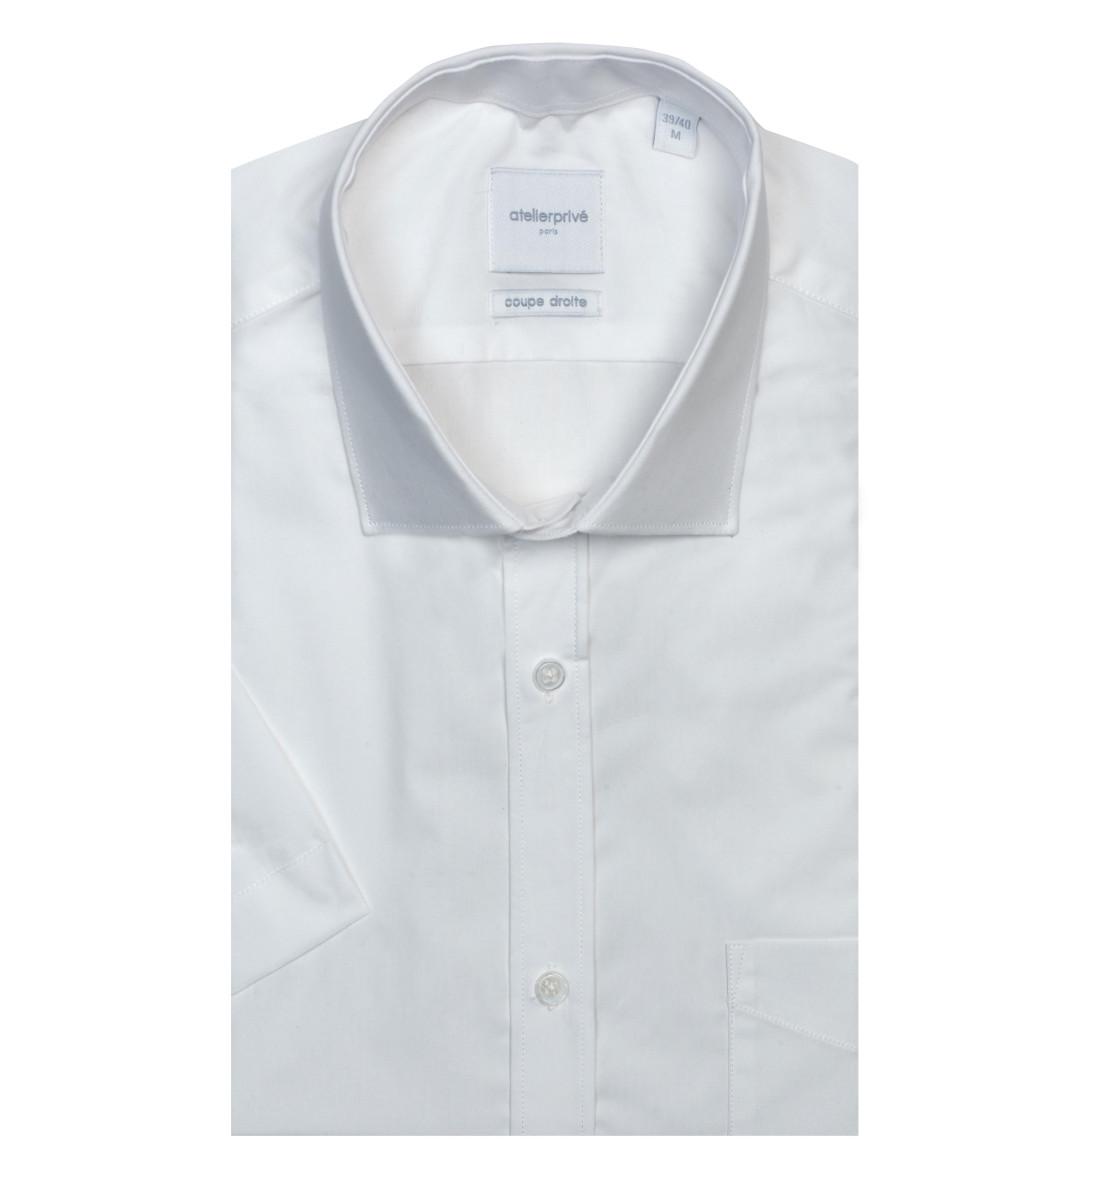 Chemise ajustée NAHYL blanc